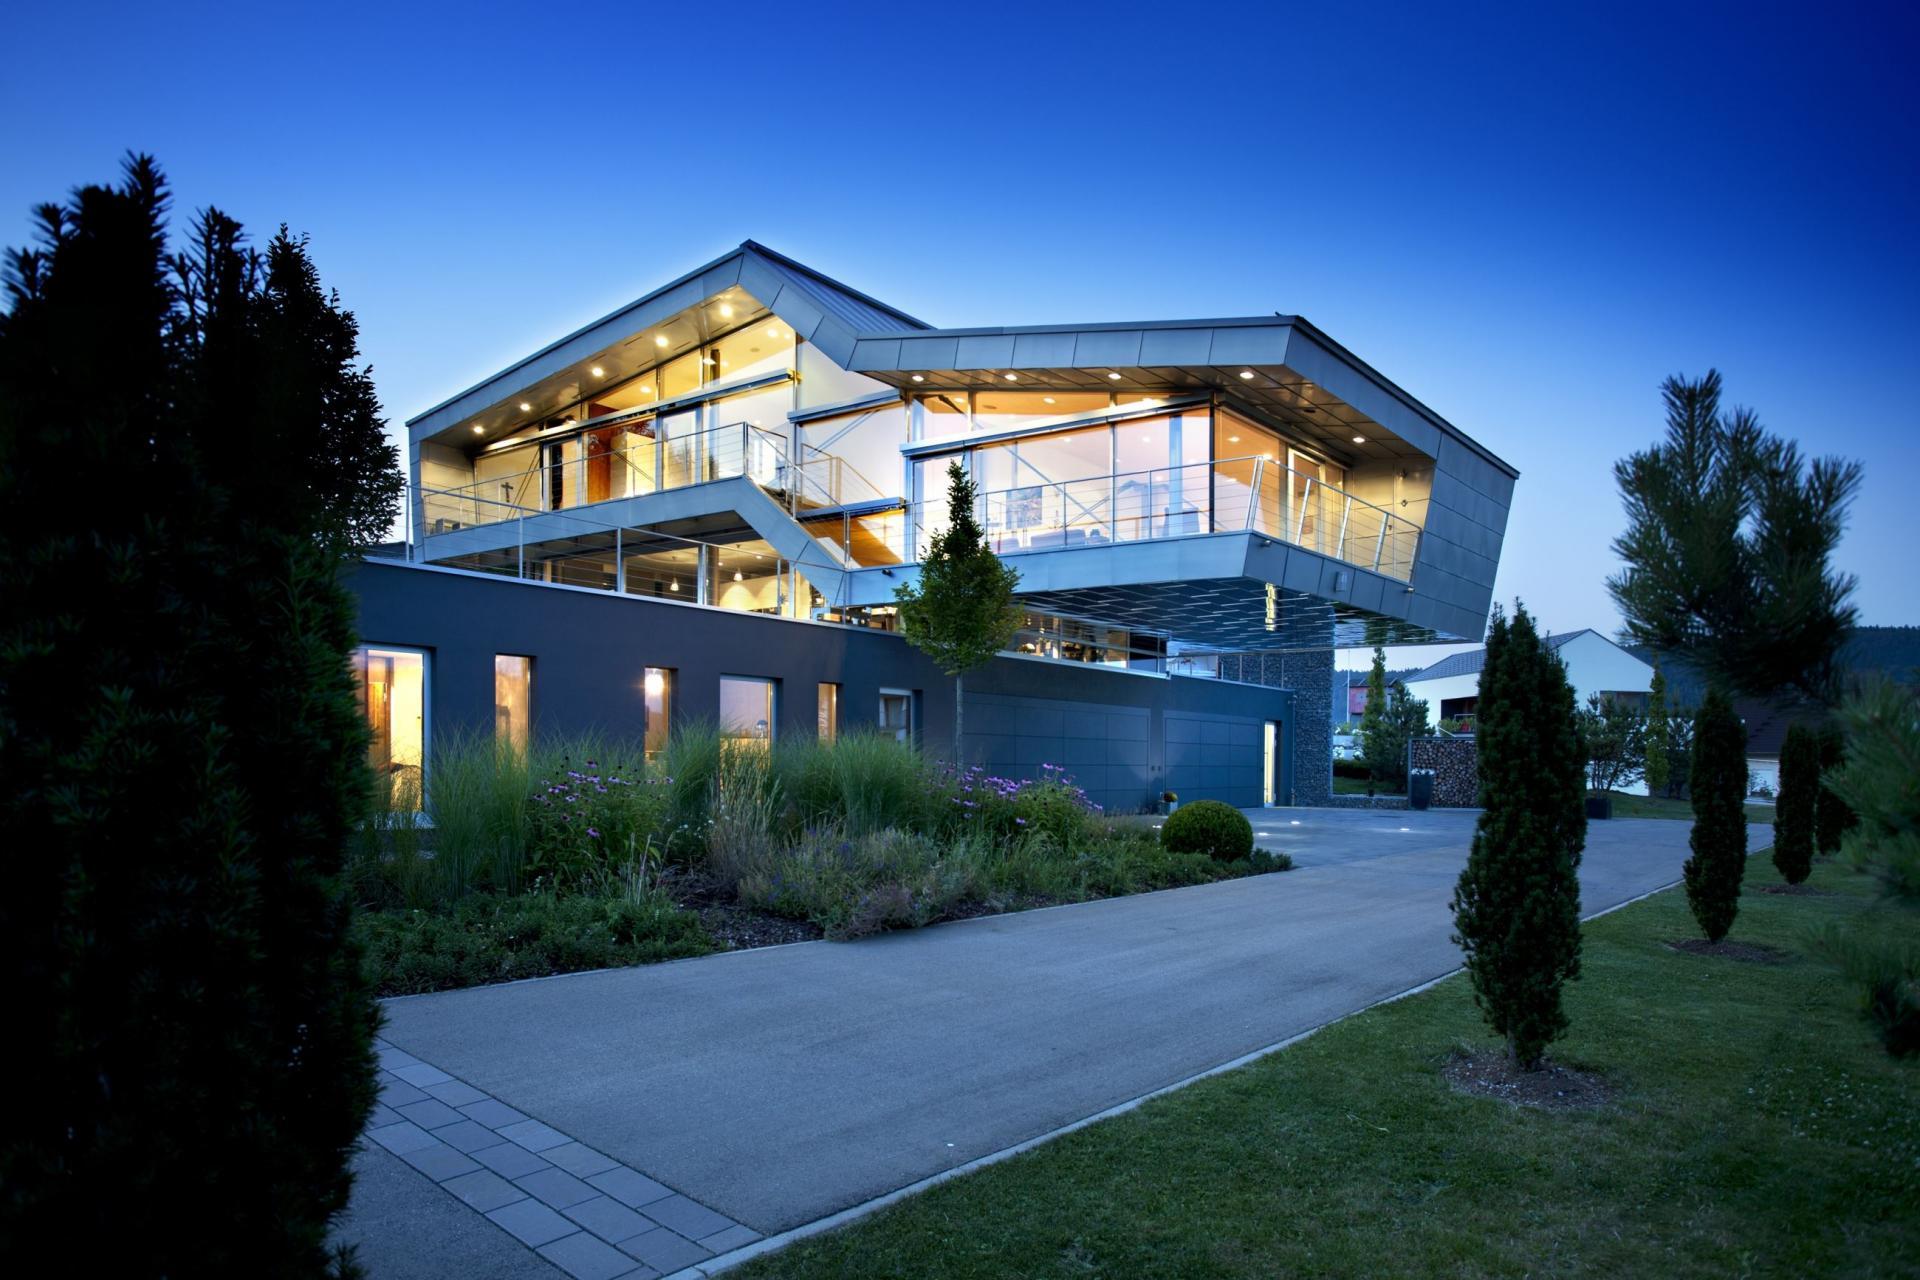 An Engineer's Incredible High Tech Dream Home